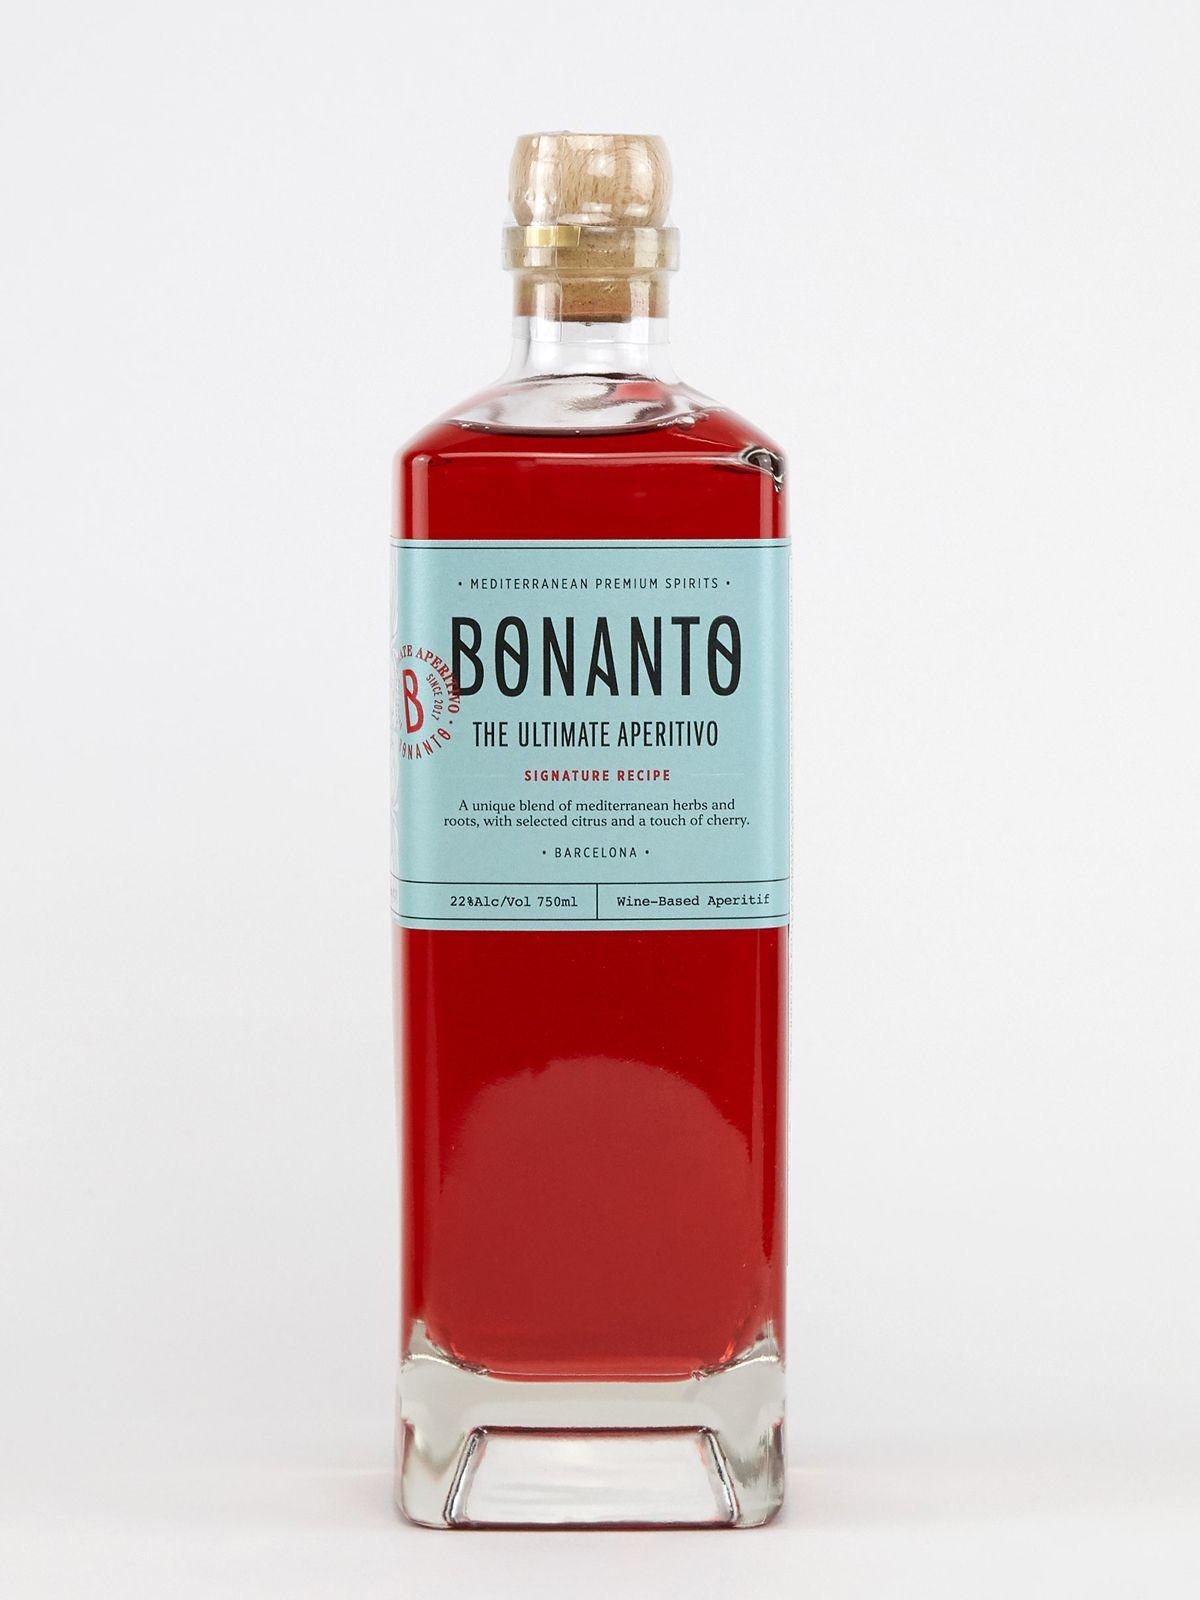 Bonanto The Ultimate Aperitivo - Zutat im Cocktail Set